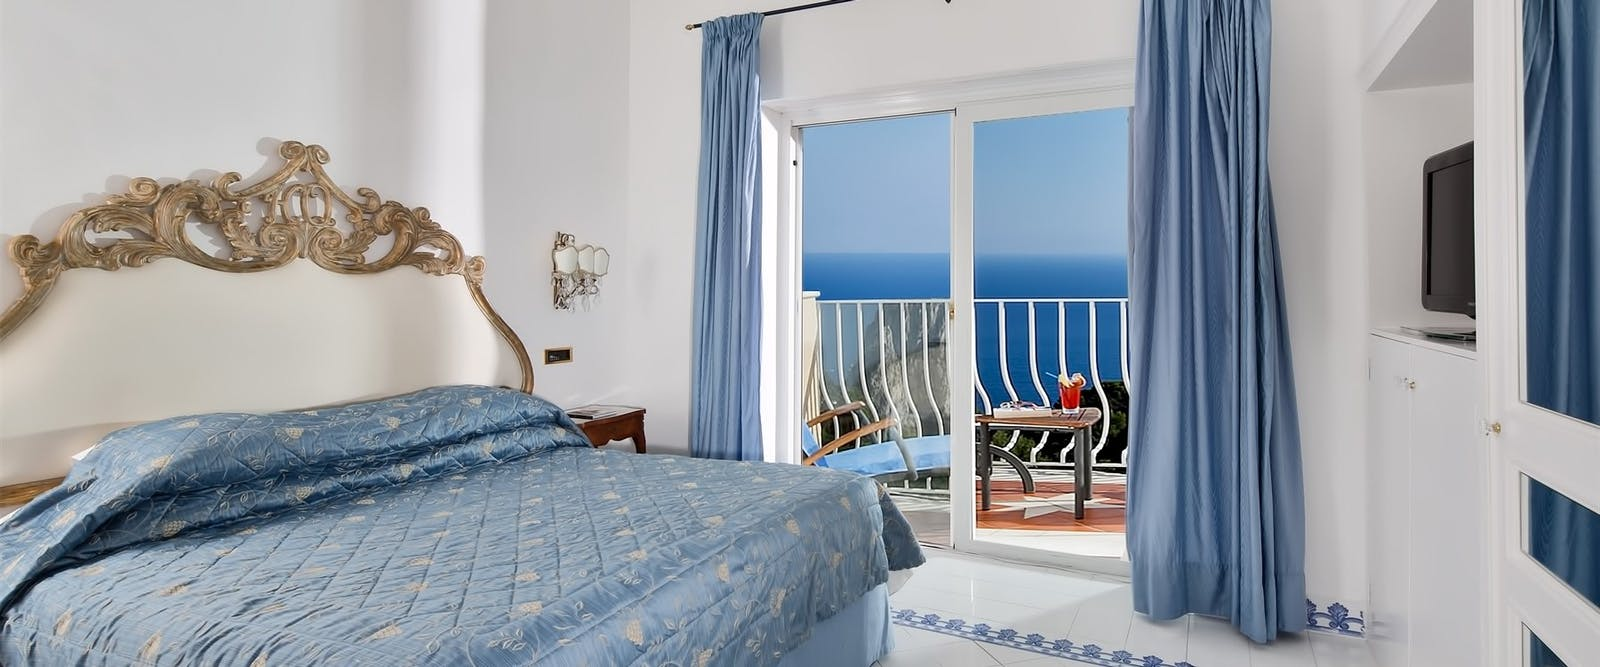 Grand Hotel Quisisana Holidays Luxury Capri Hotel